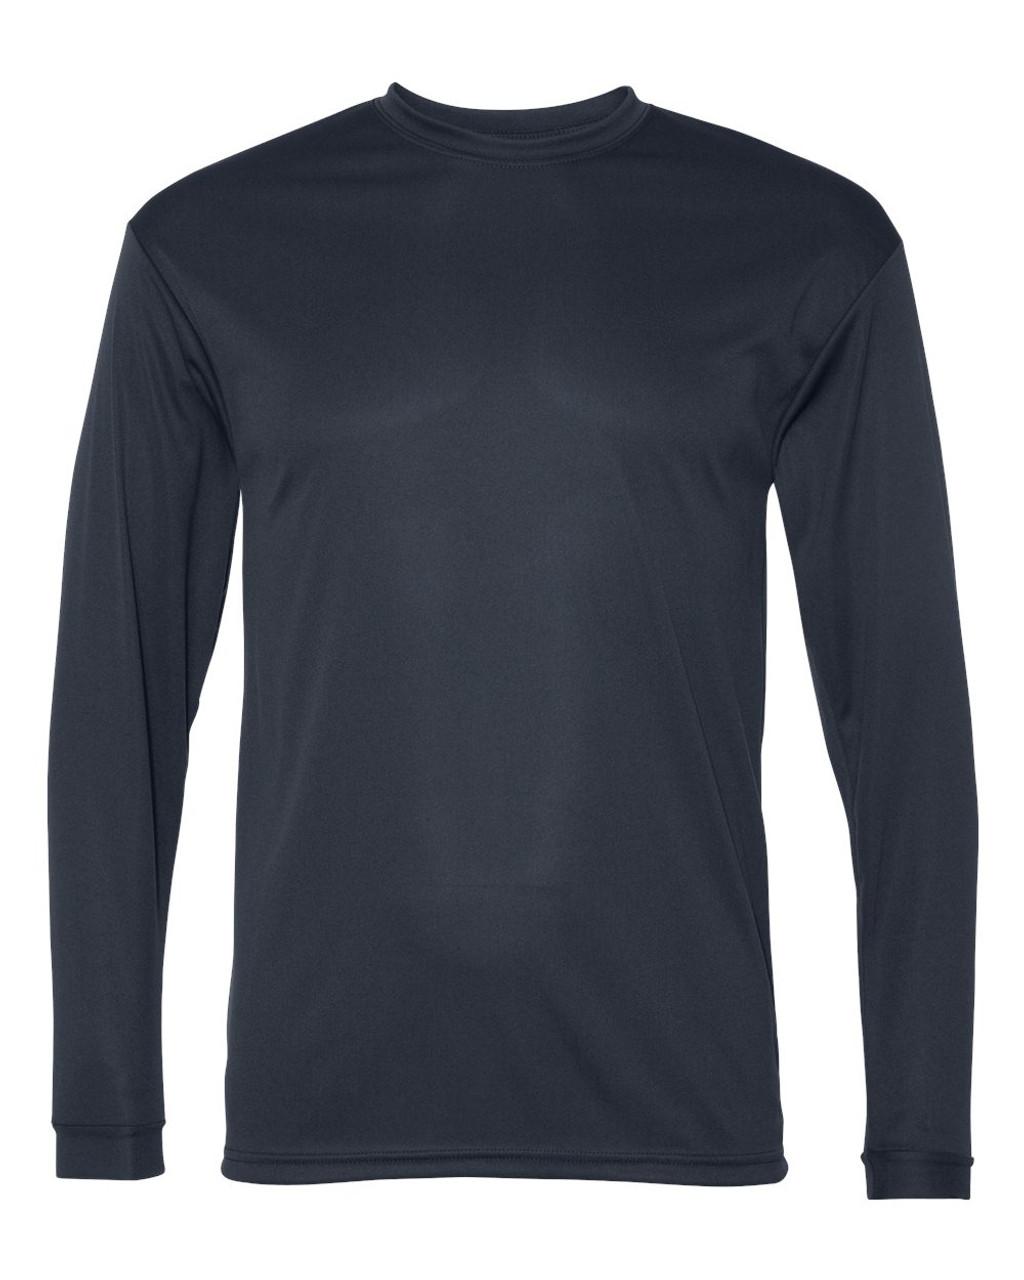 5104 C2 Sport Performance Long Sleeve T-Shirt | T-shirt.ca